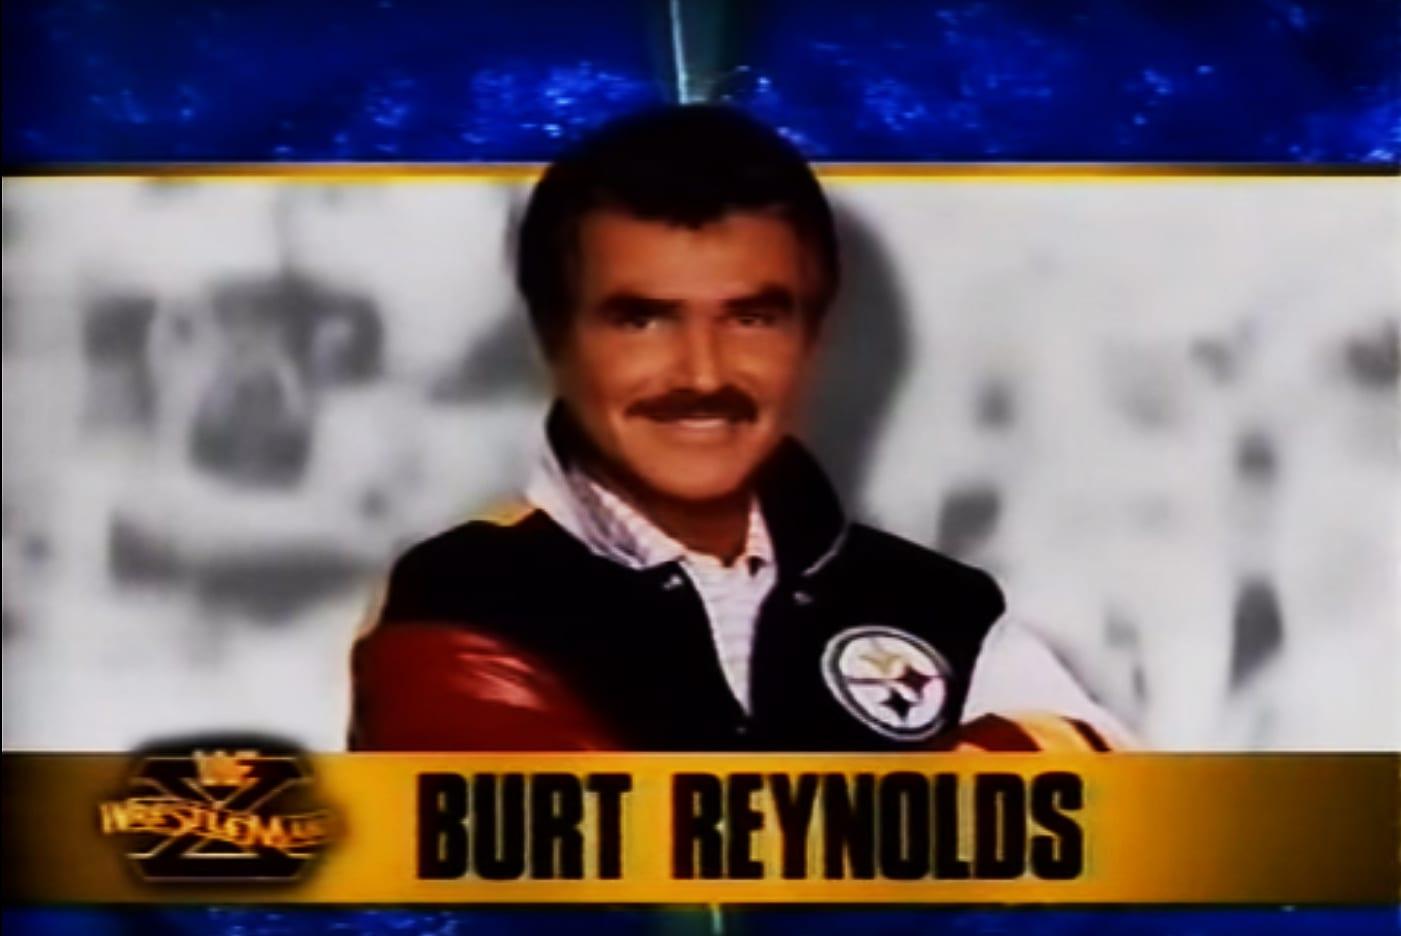 Burt Reynolds WrestleMania X